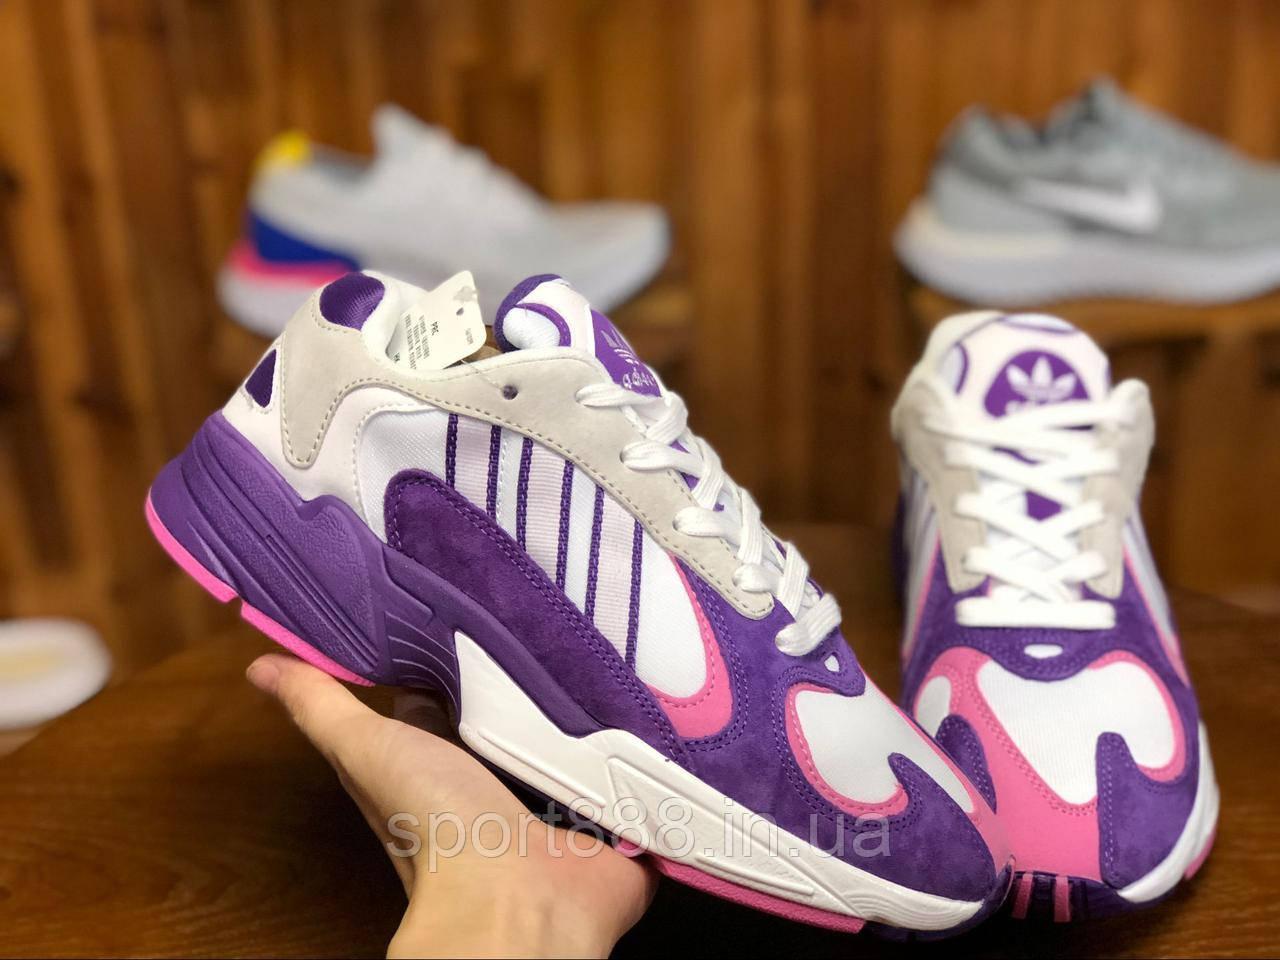 Adidas Originals Yung 1 Dragon Ball Z Frieza мужские кроссовки ... 642ec629a